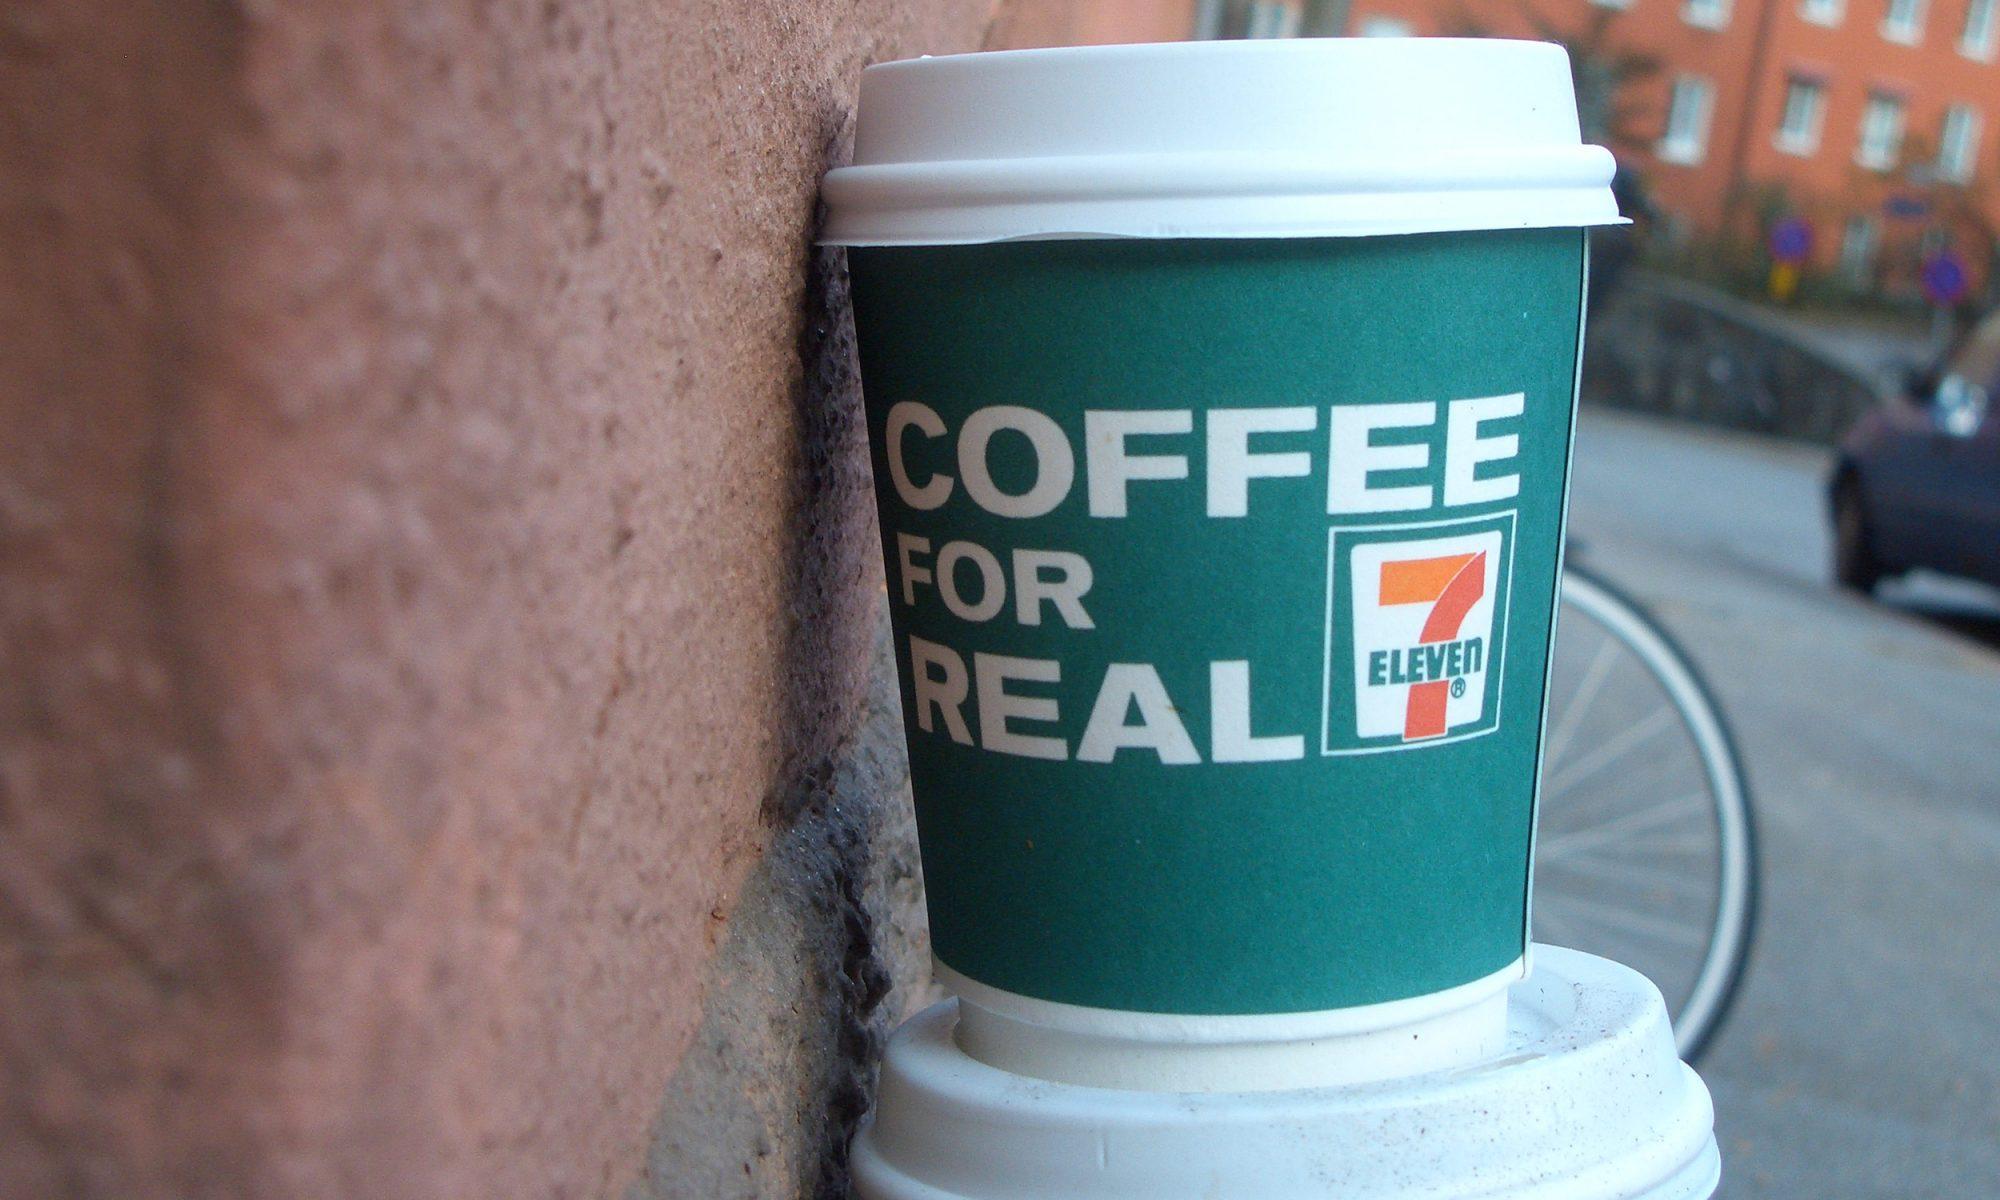 EC: 7-Eleven Has Sustainably Sourced, Single-Origin Coffee Now